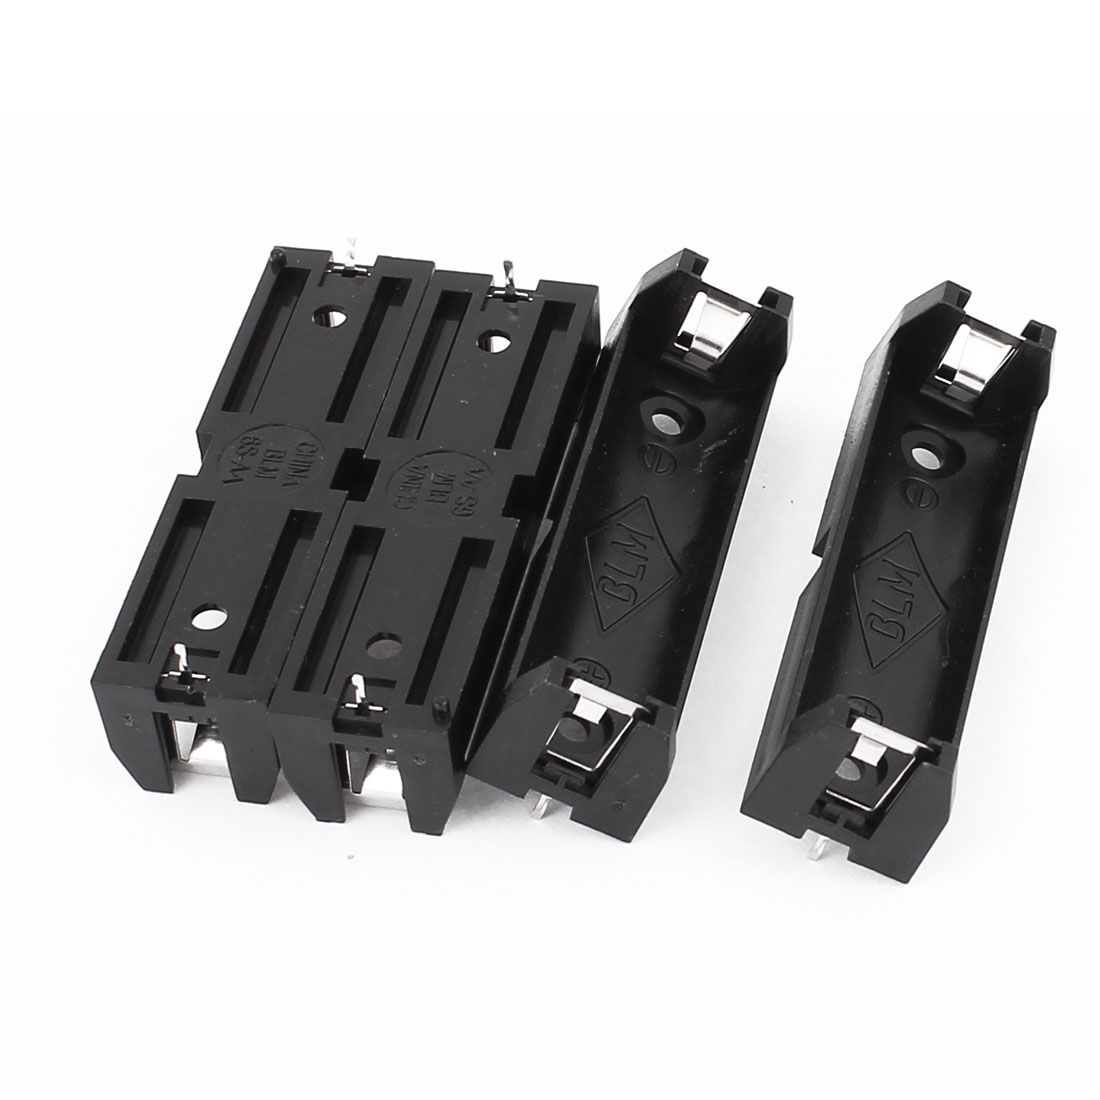 4Pcs Plastic 2 Terminals 1 x 1.5V AA Battery Holder Box Case Black